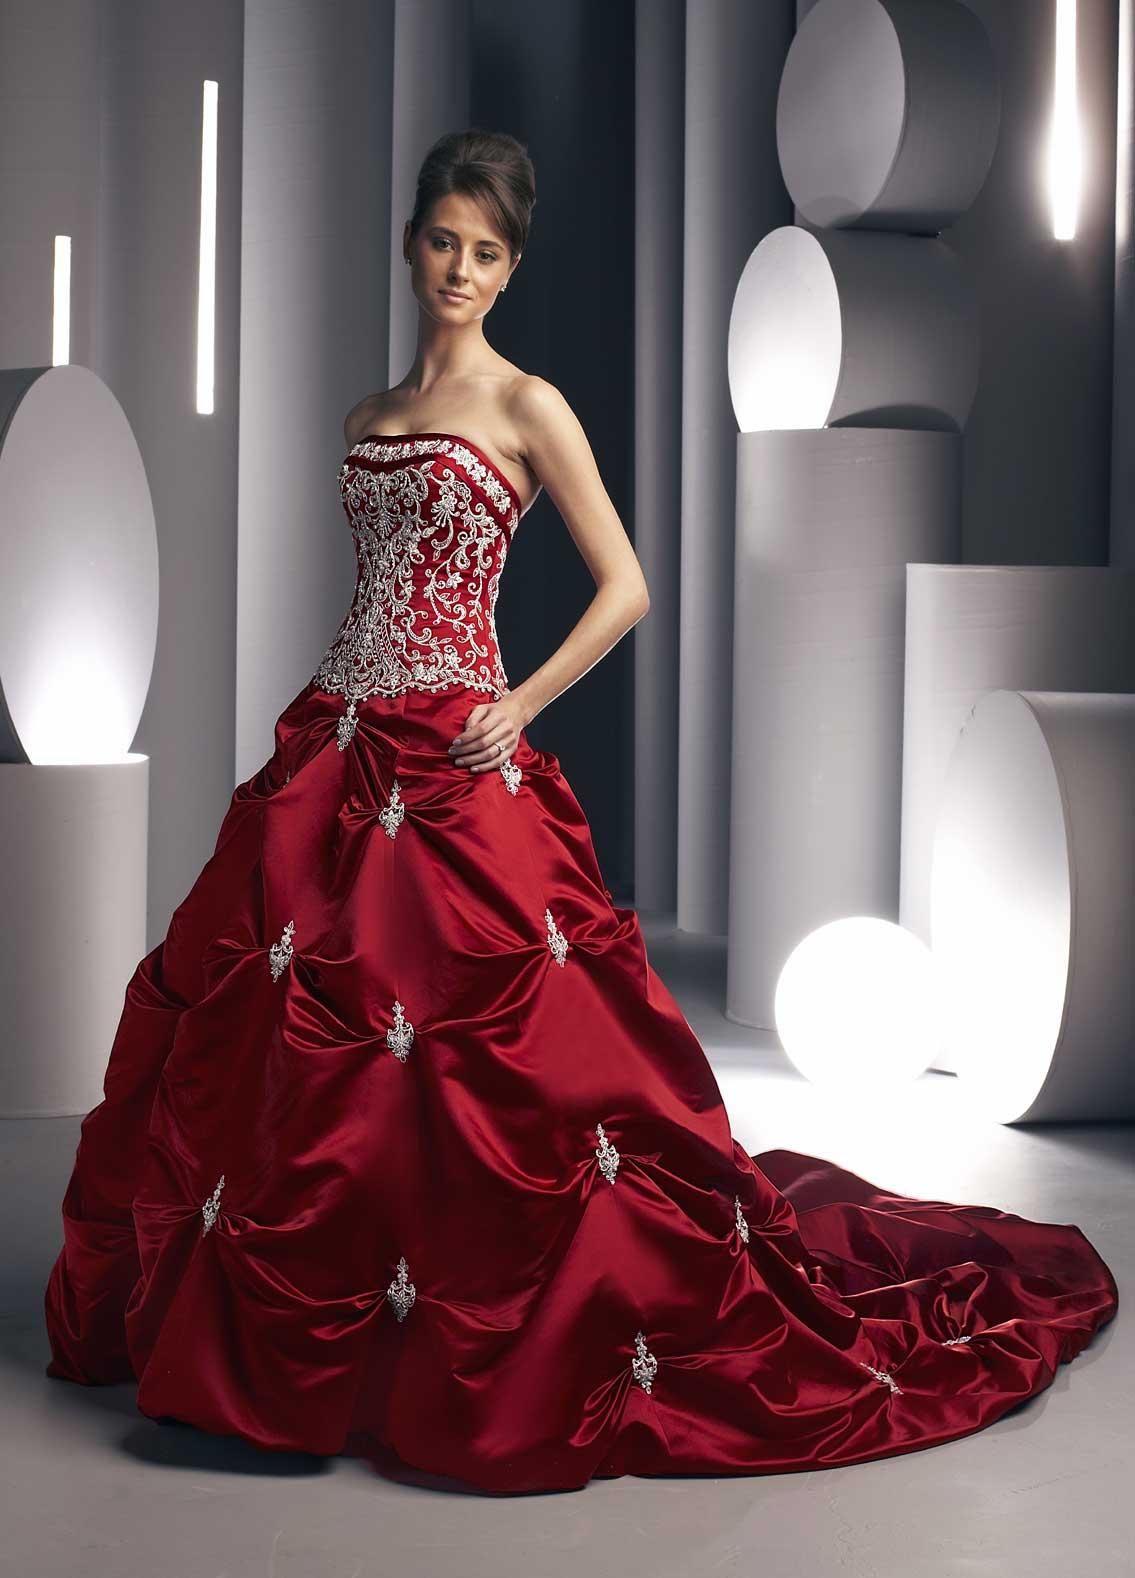 Aimee 79 wedding gown red wedding dress